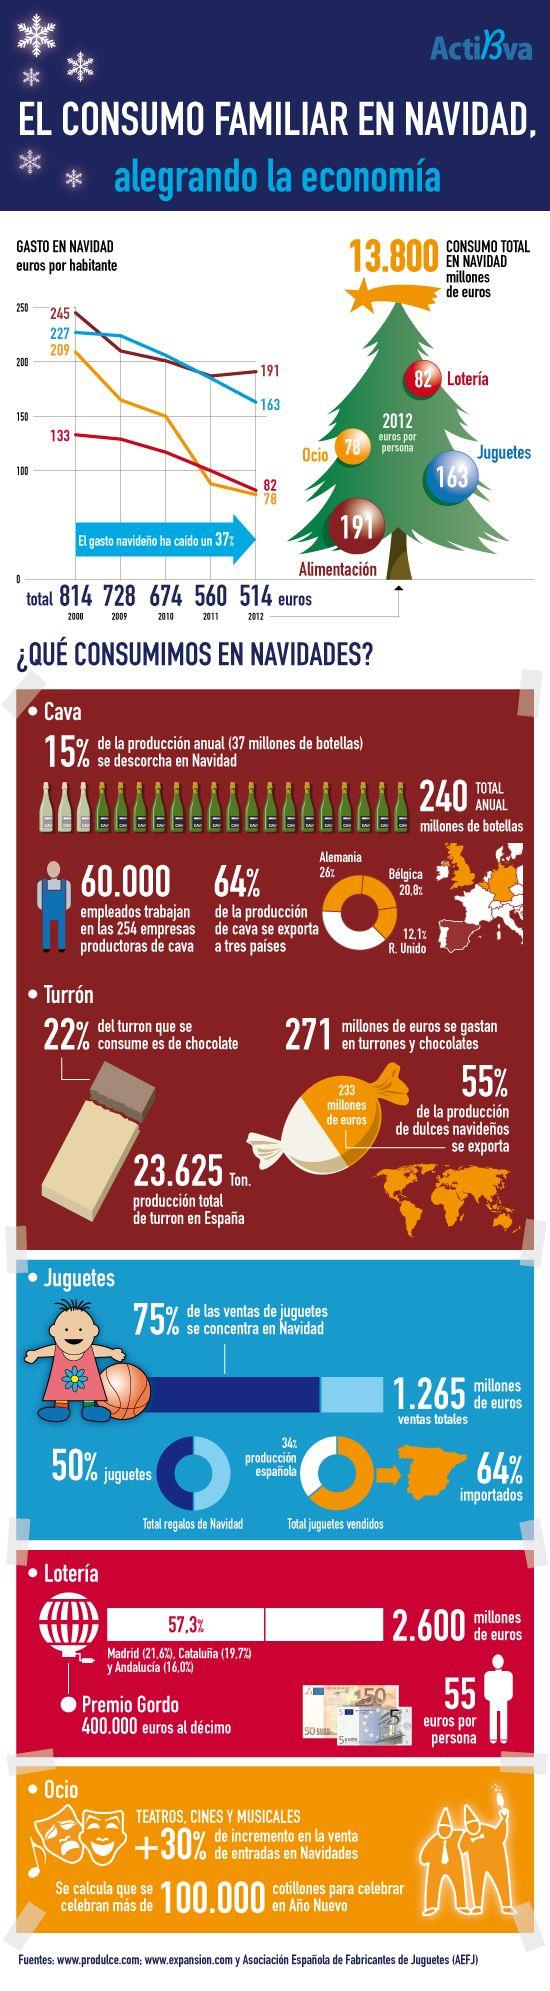 El consumo familiar en Navidades (España) #infografia